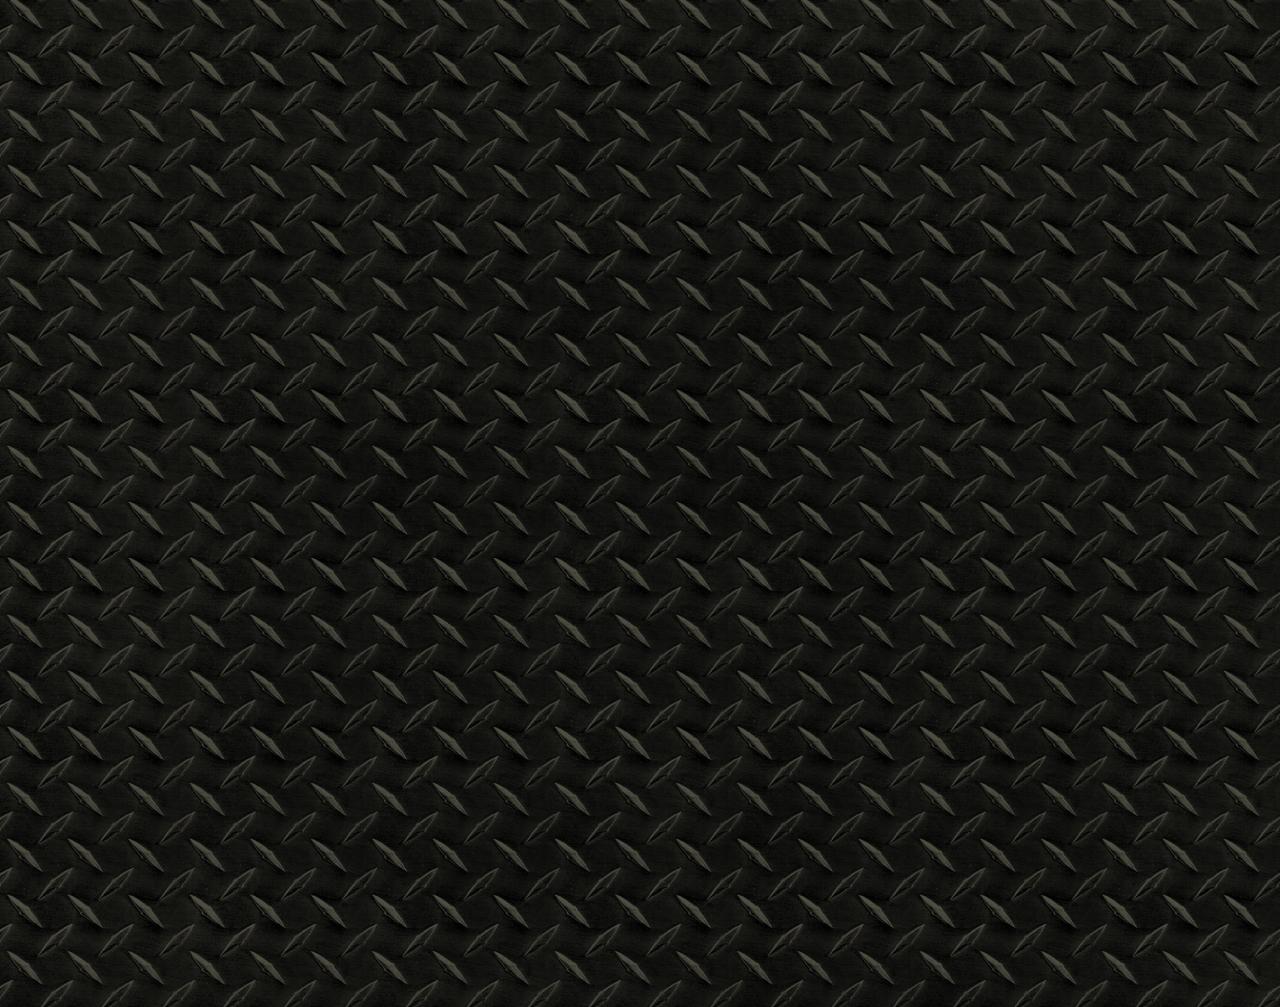 Diamond Plate PNG HD - 126899